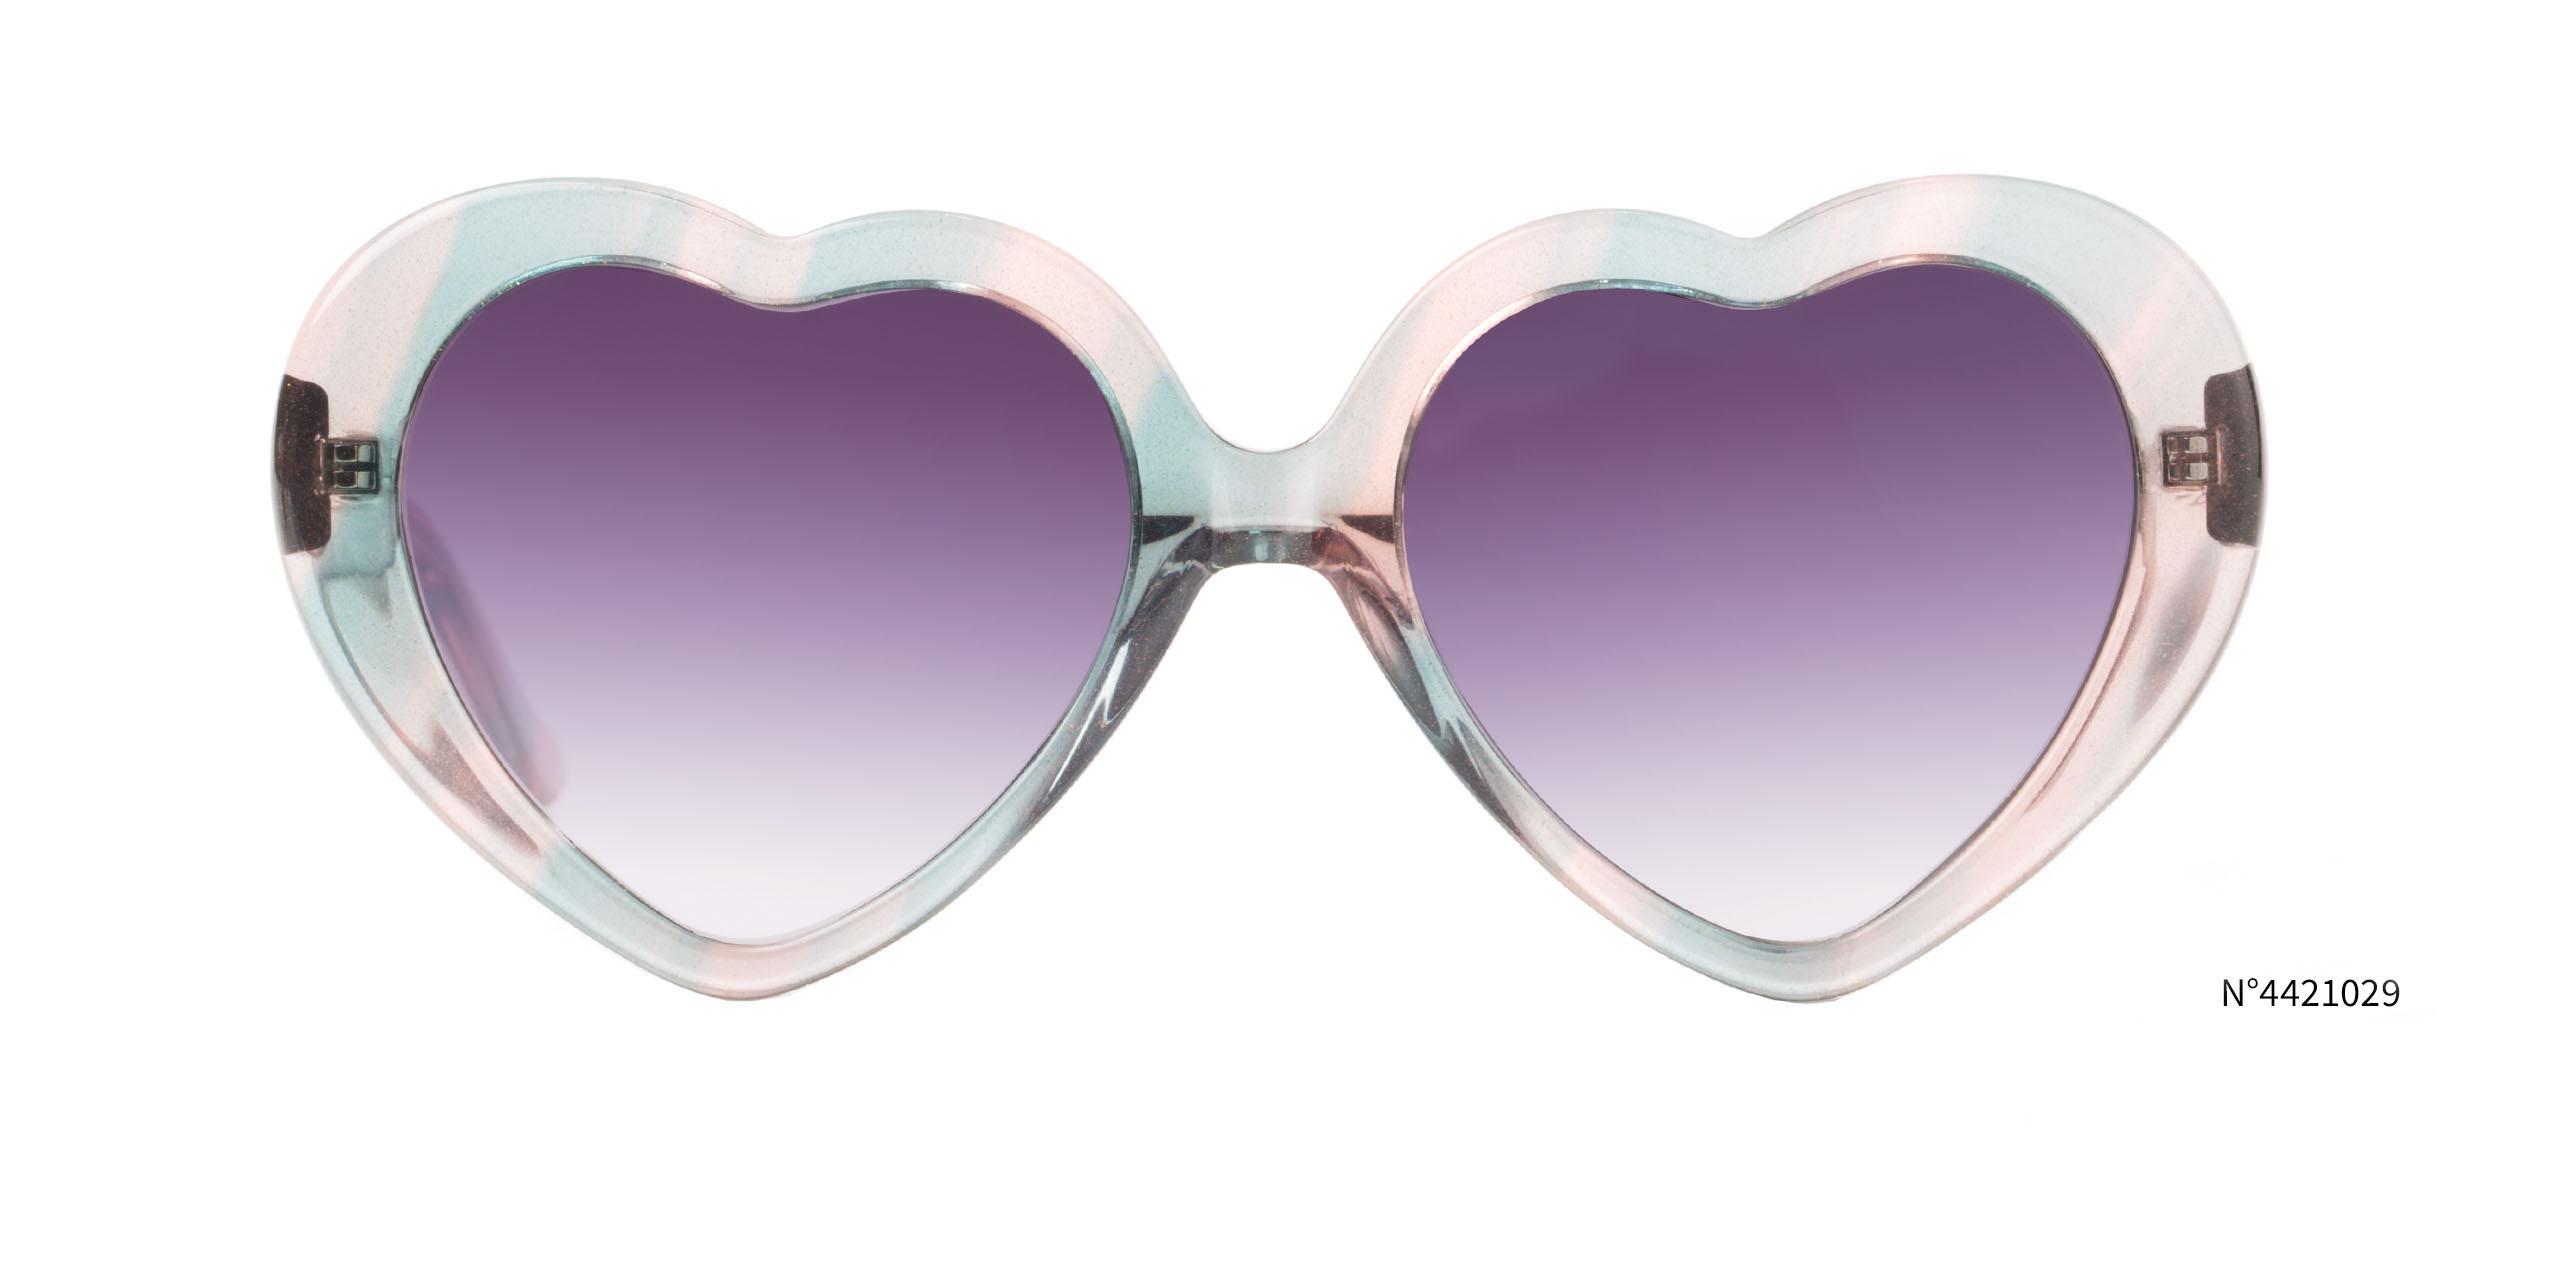 heart shaped edm sunglasses